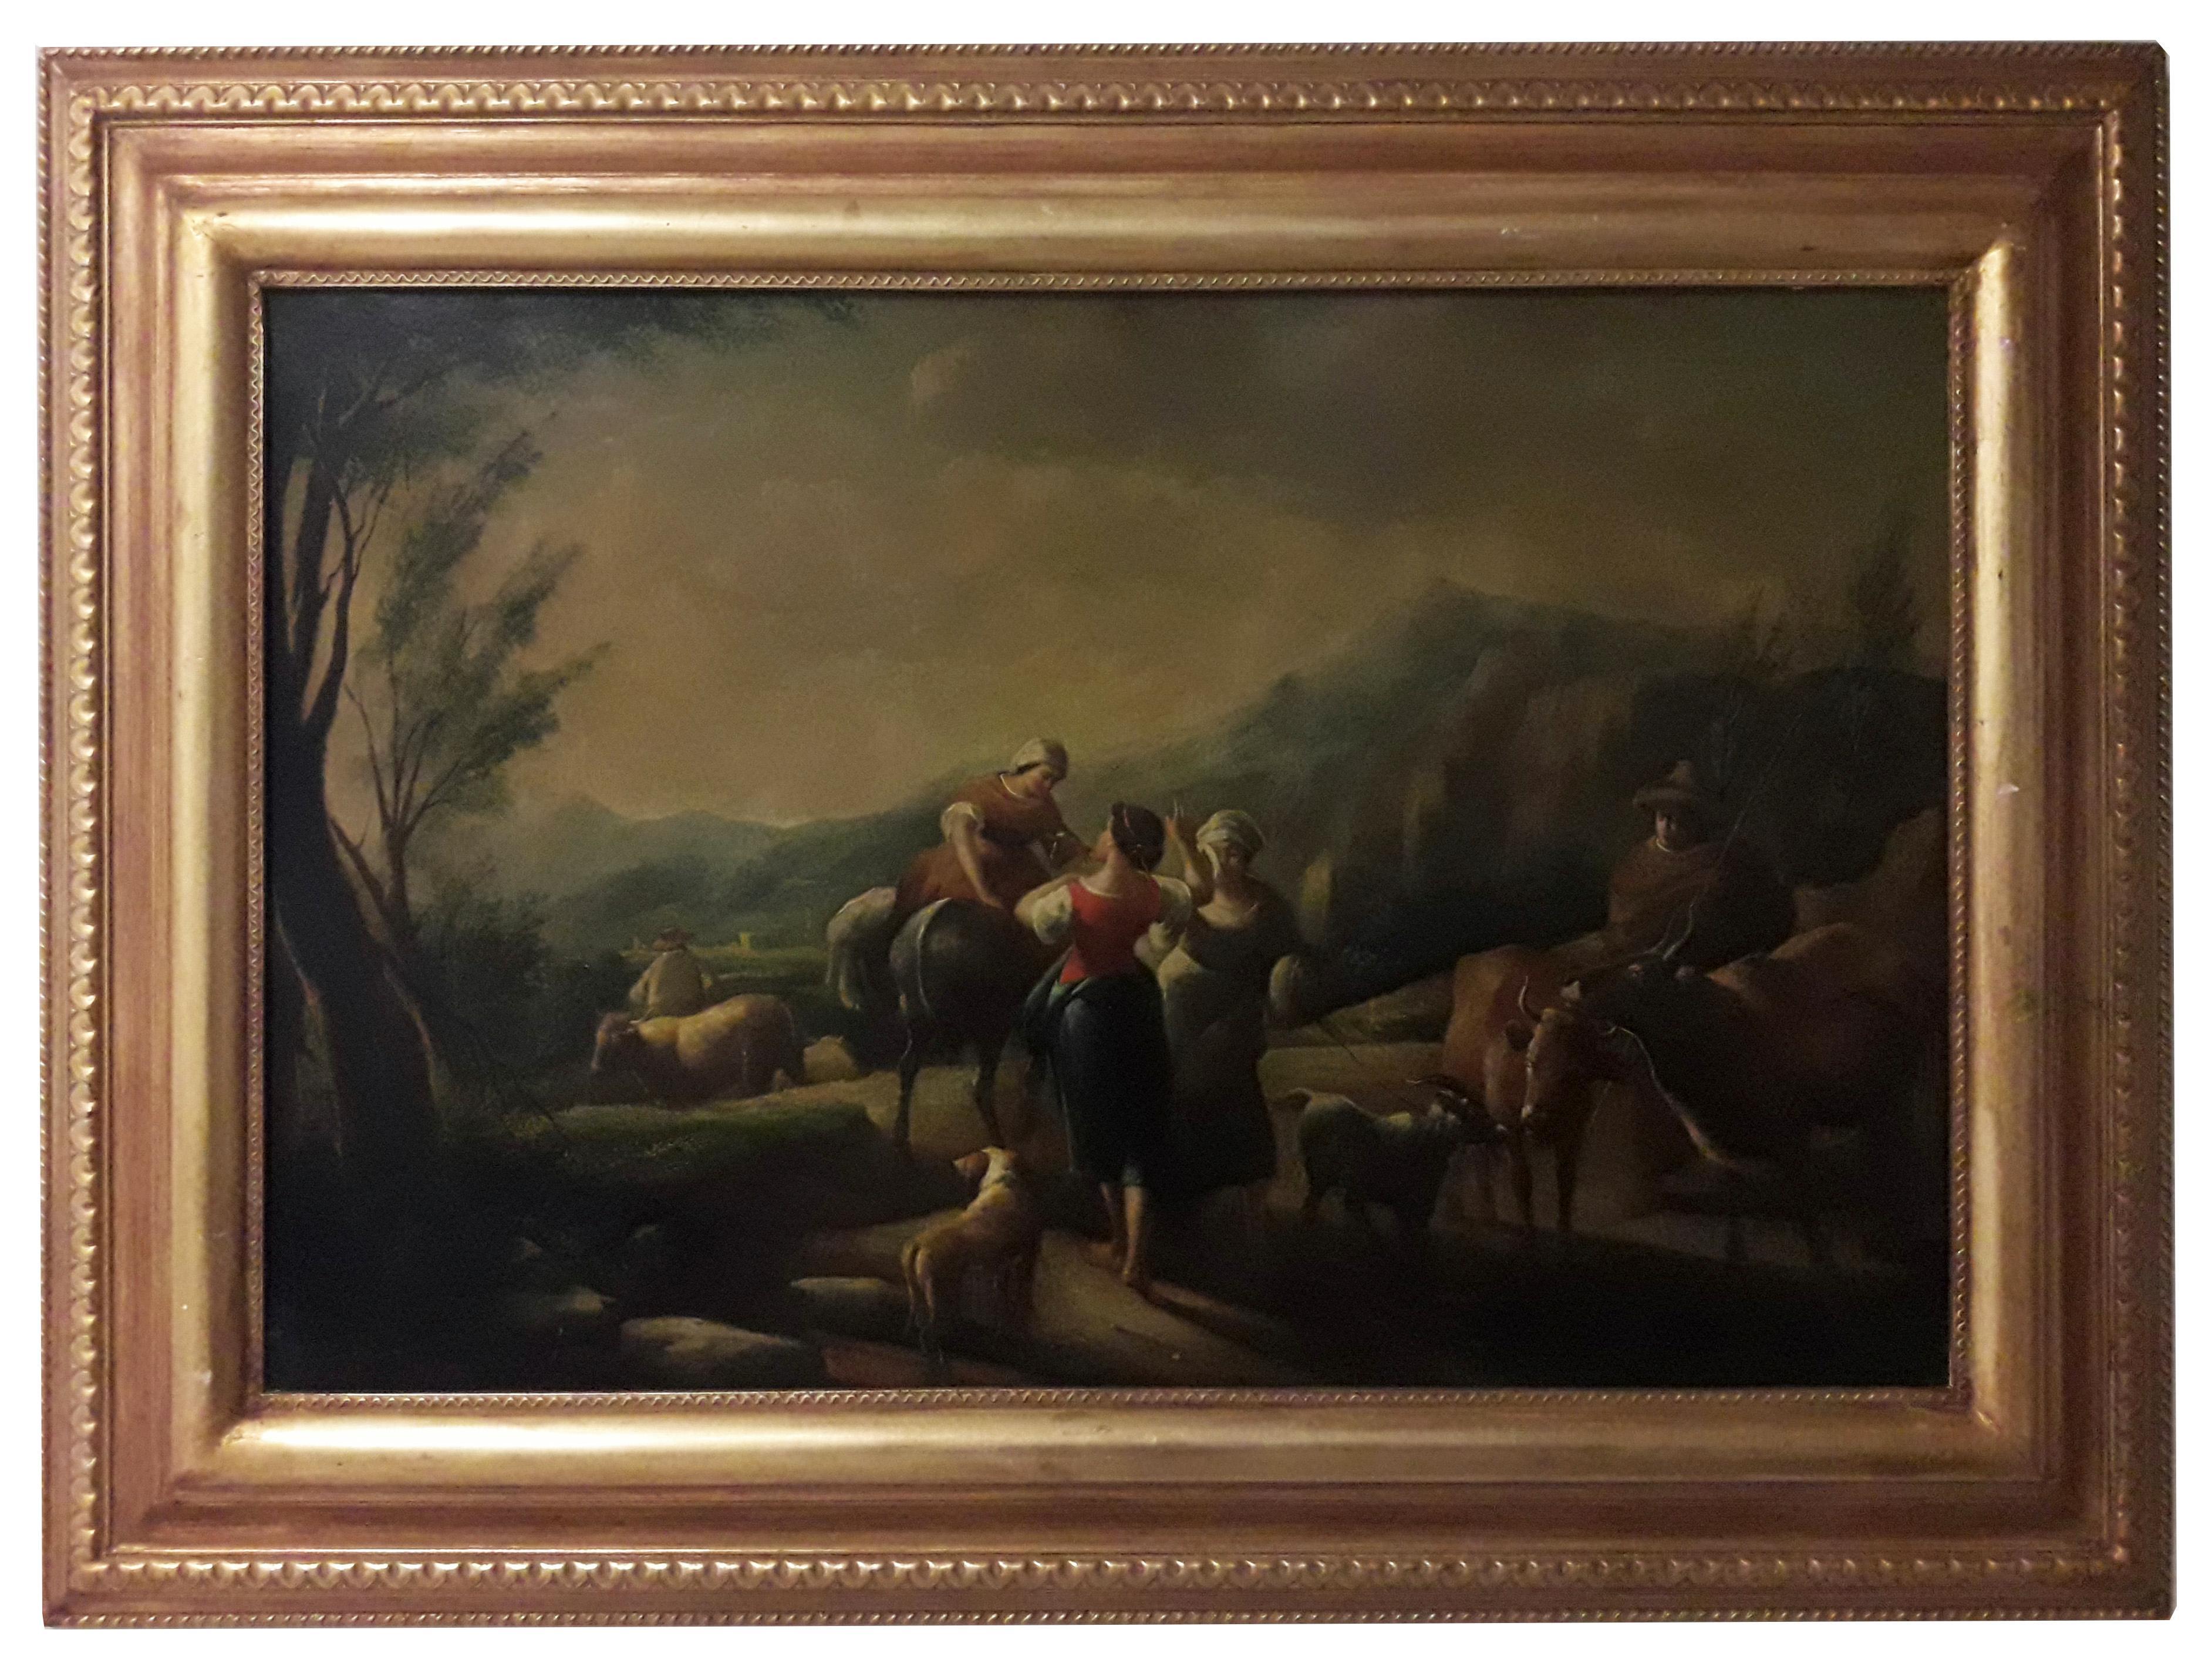 COUNTRY SCENE - Italian School -  Italy - Oil on canvas painting